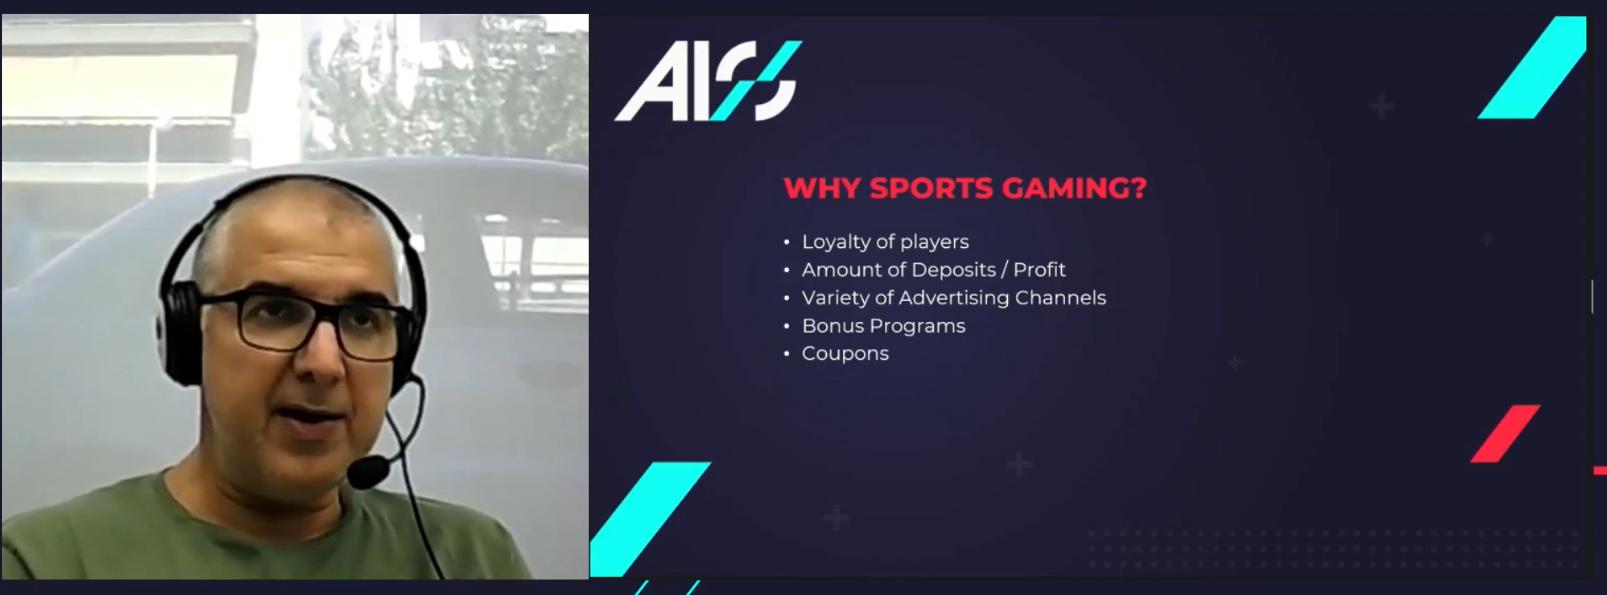 PropellerAds-ALO-sports-gaming-Dimitris